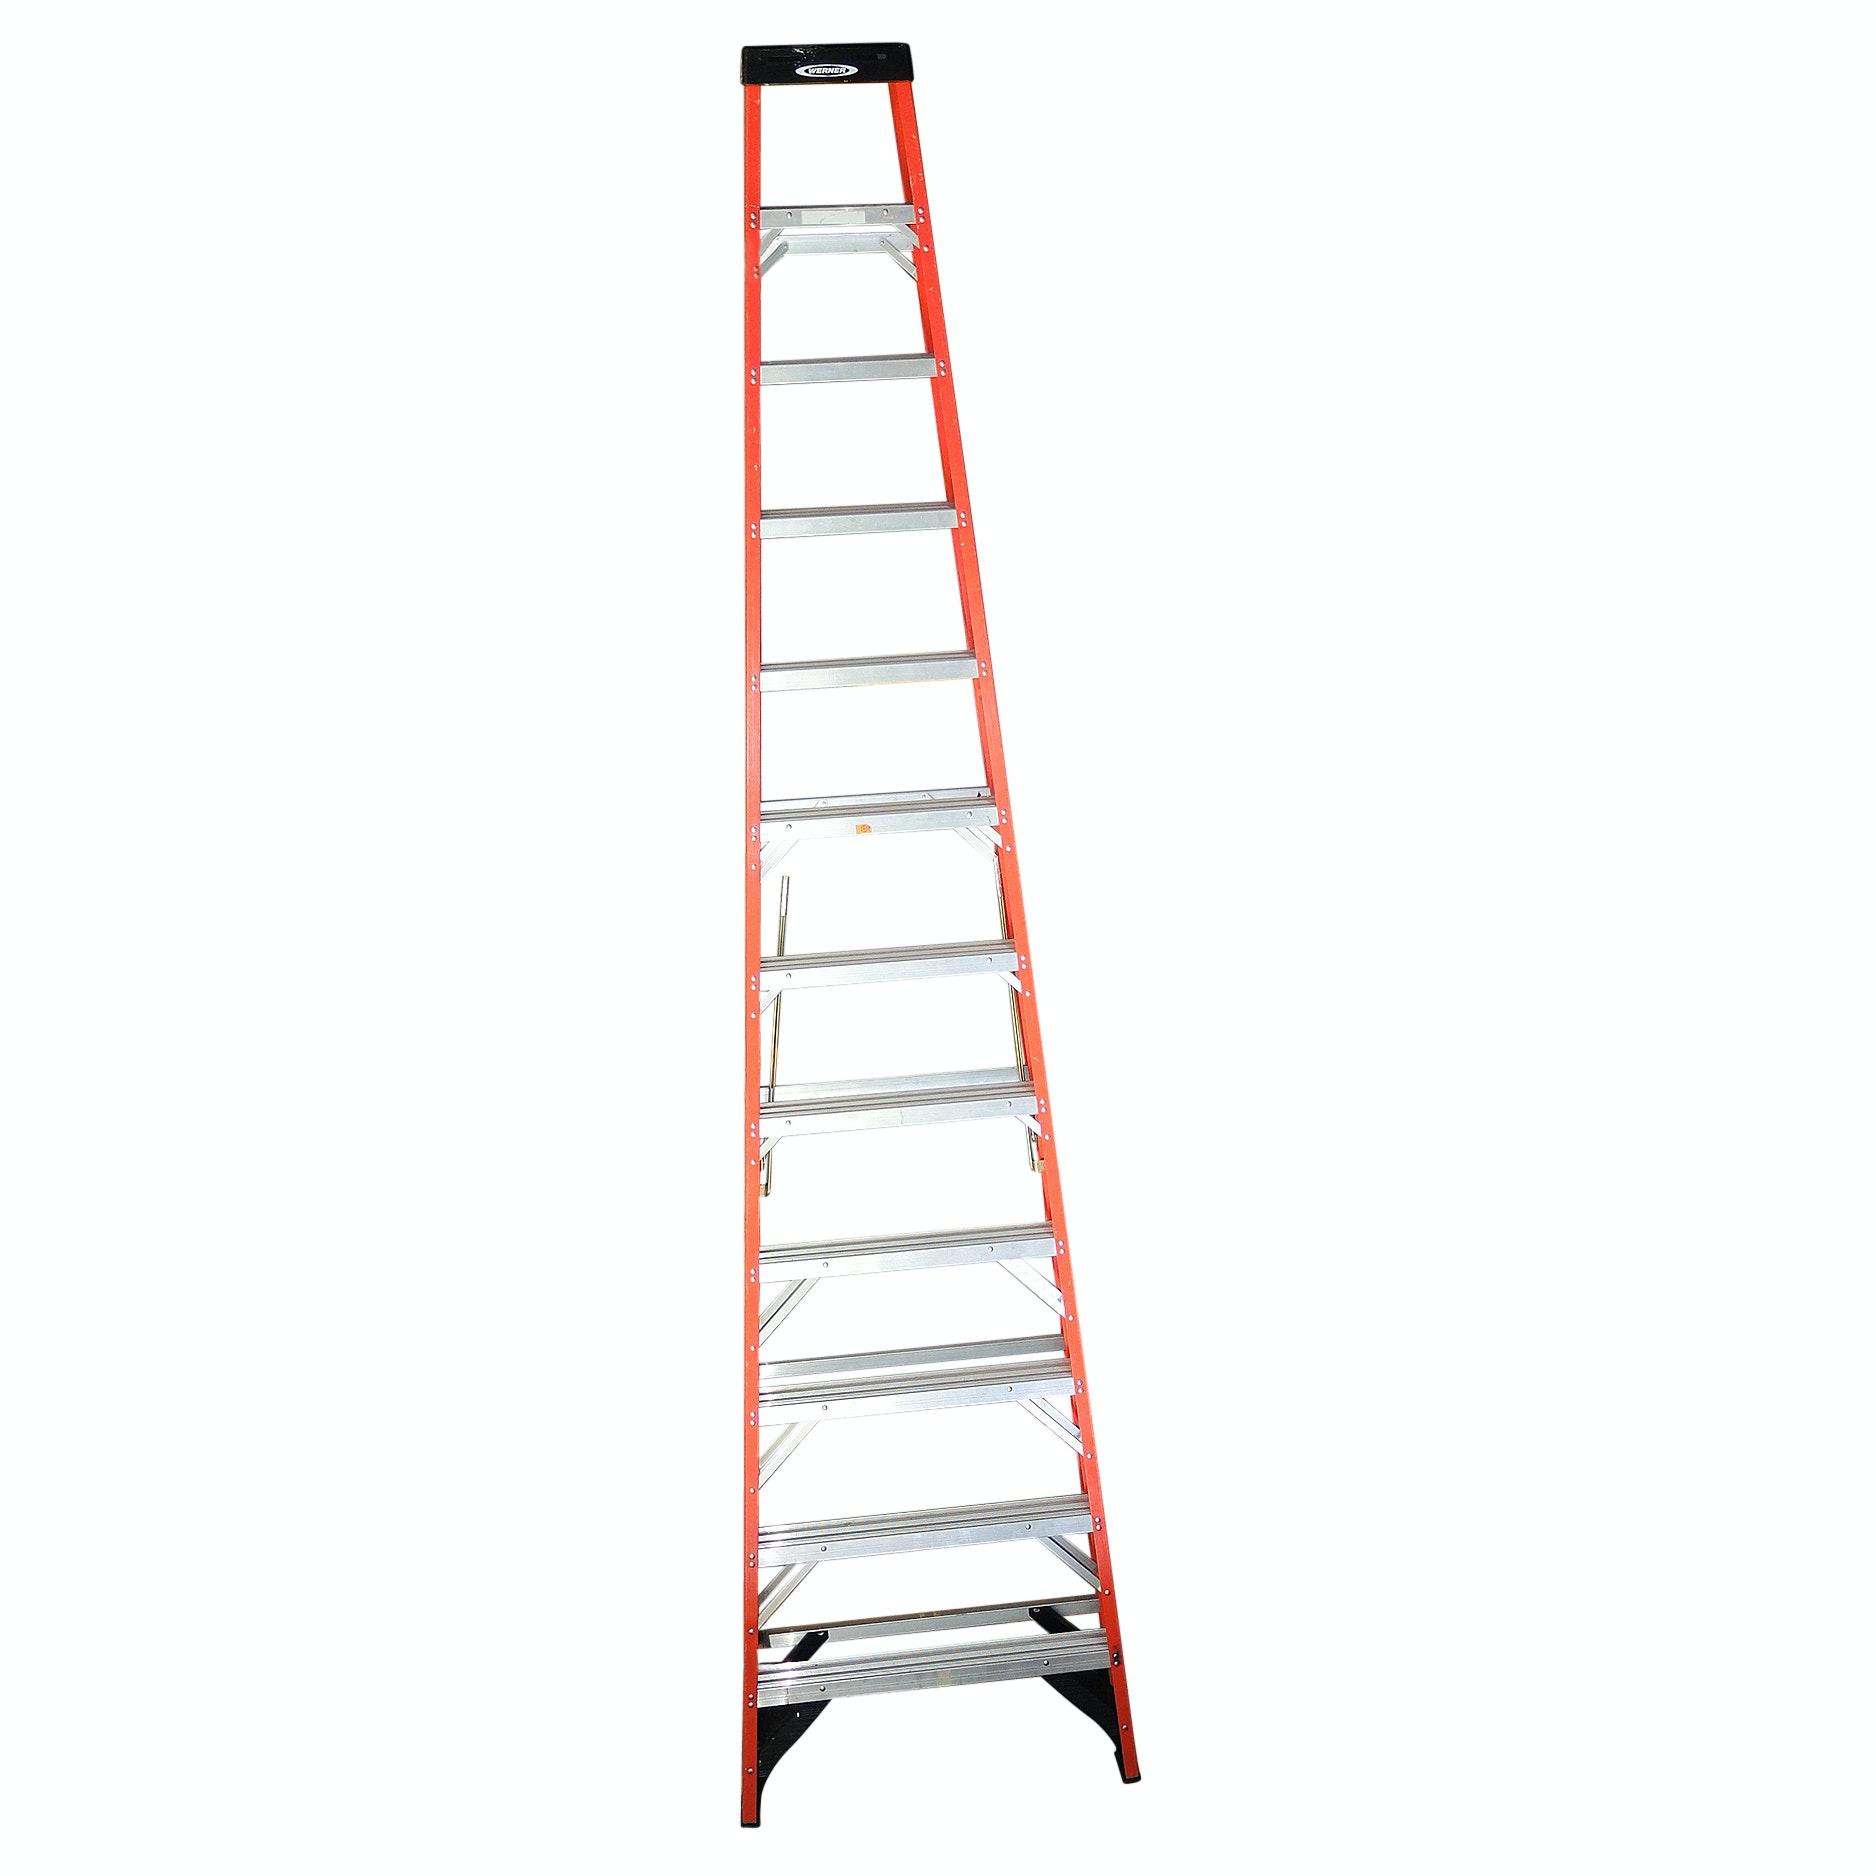 Werner 12 Foot Fiberglass Step Ladder